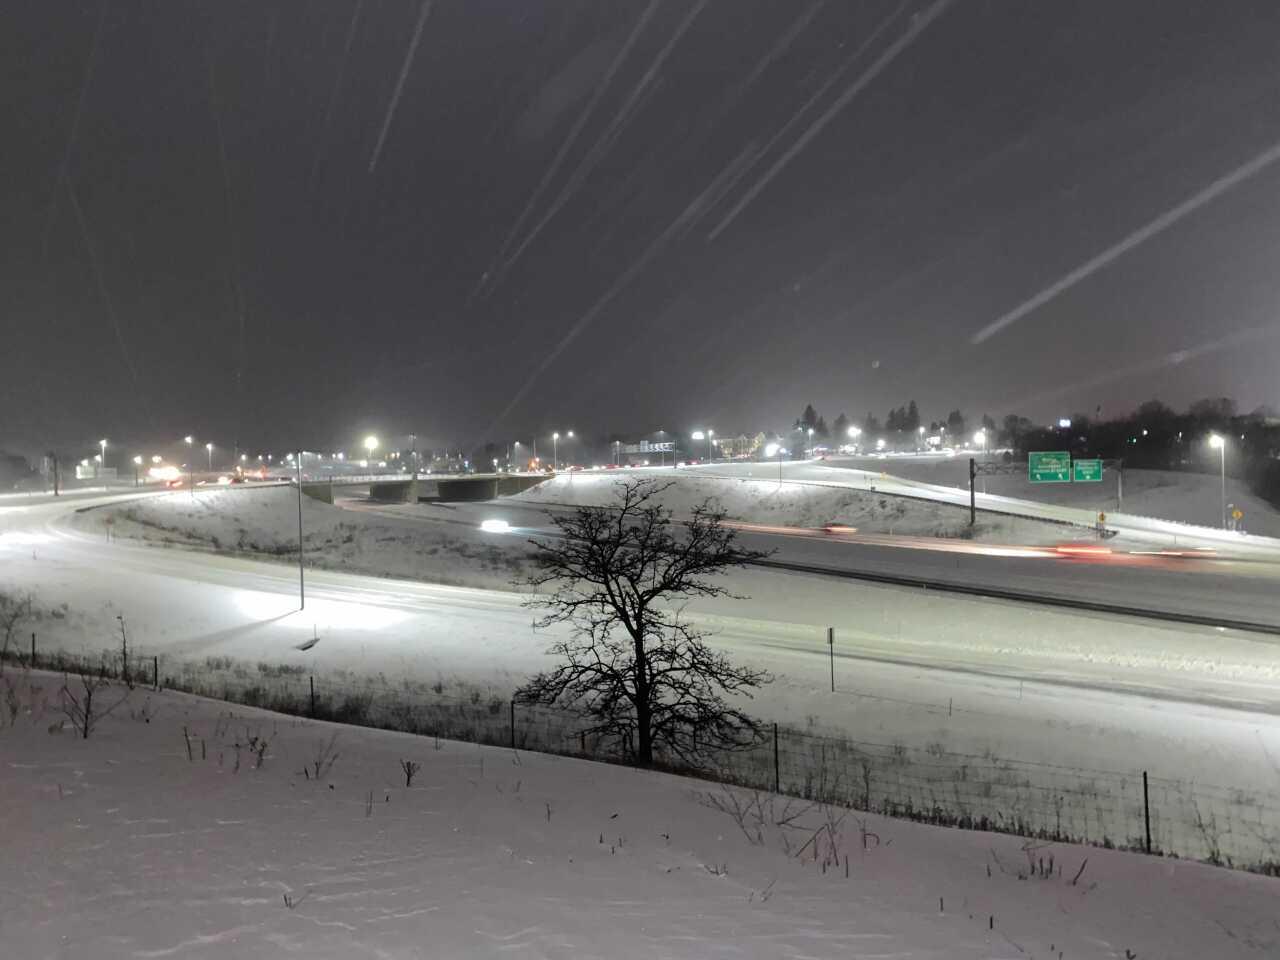 I-94 near Stadium Drive in Kalamazoo after snowfall 2/16/2021